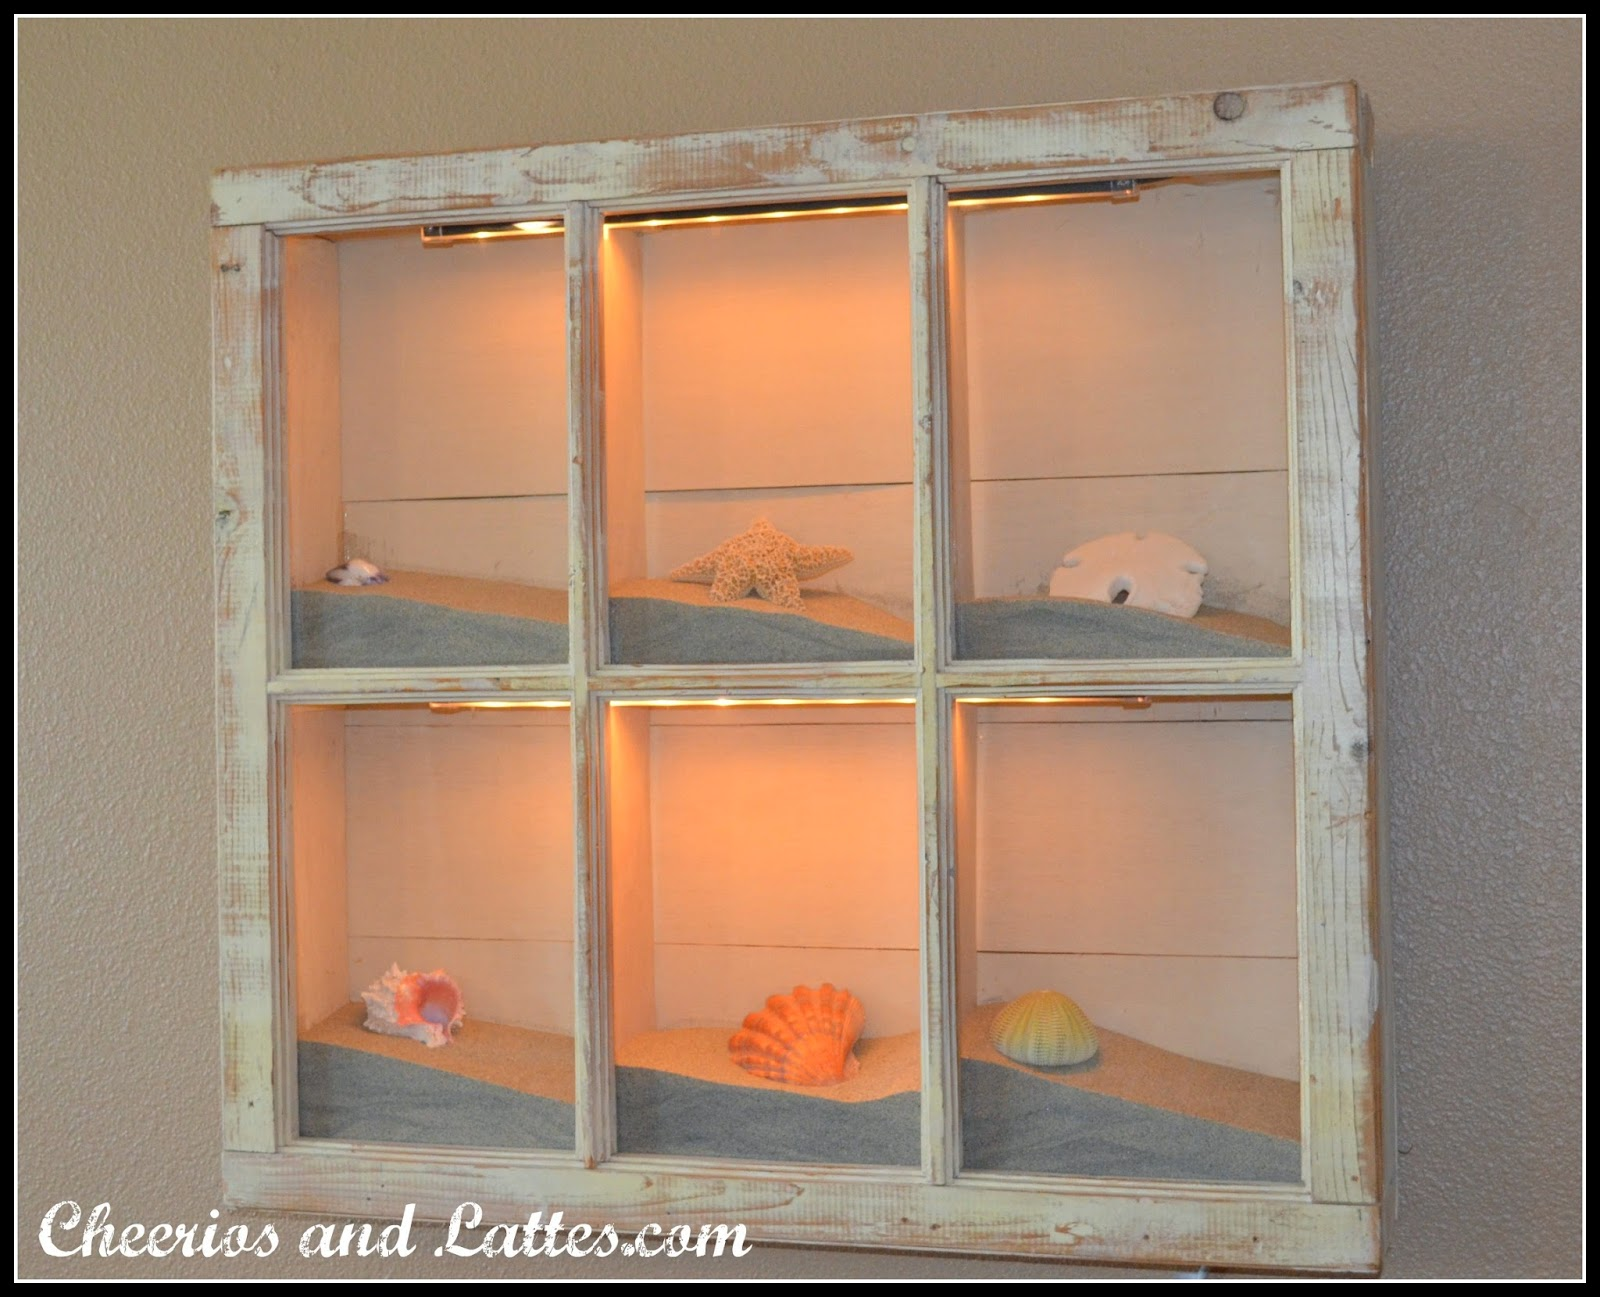 dekorasyon-deniz-tasi-kum-ahsap-pencere-eskitme